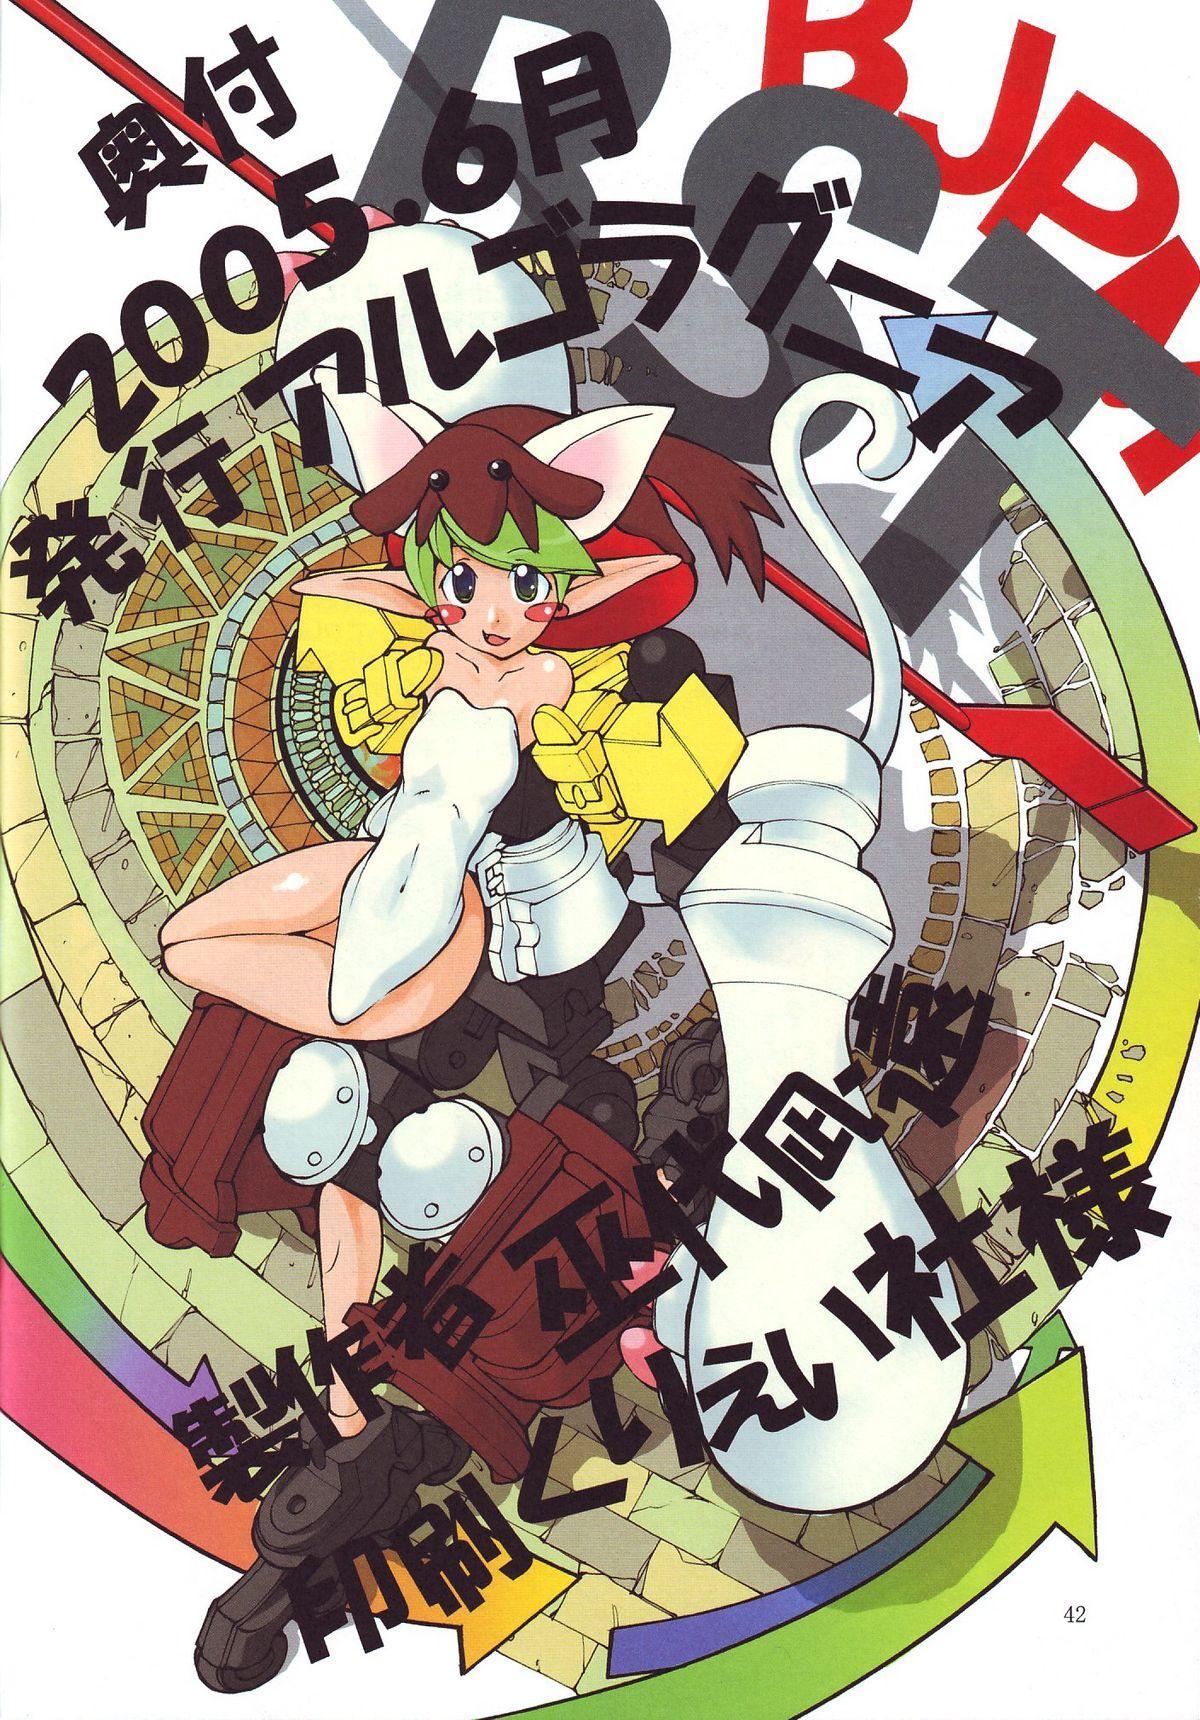 Jadouou 2004 - Bakuretsu Tenshi 40